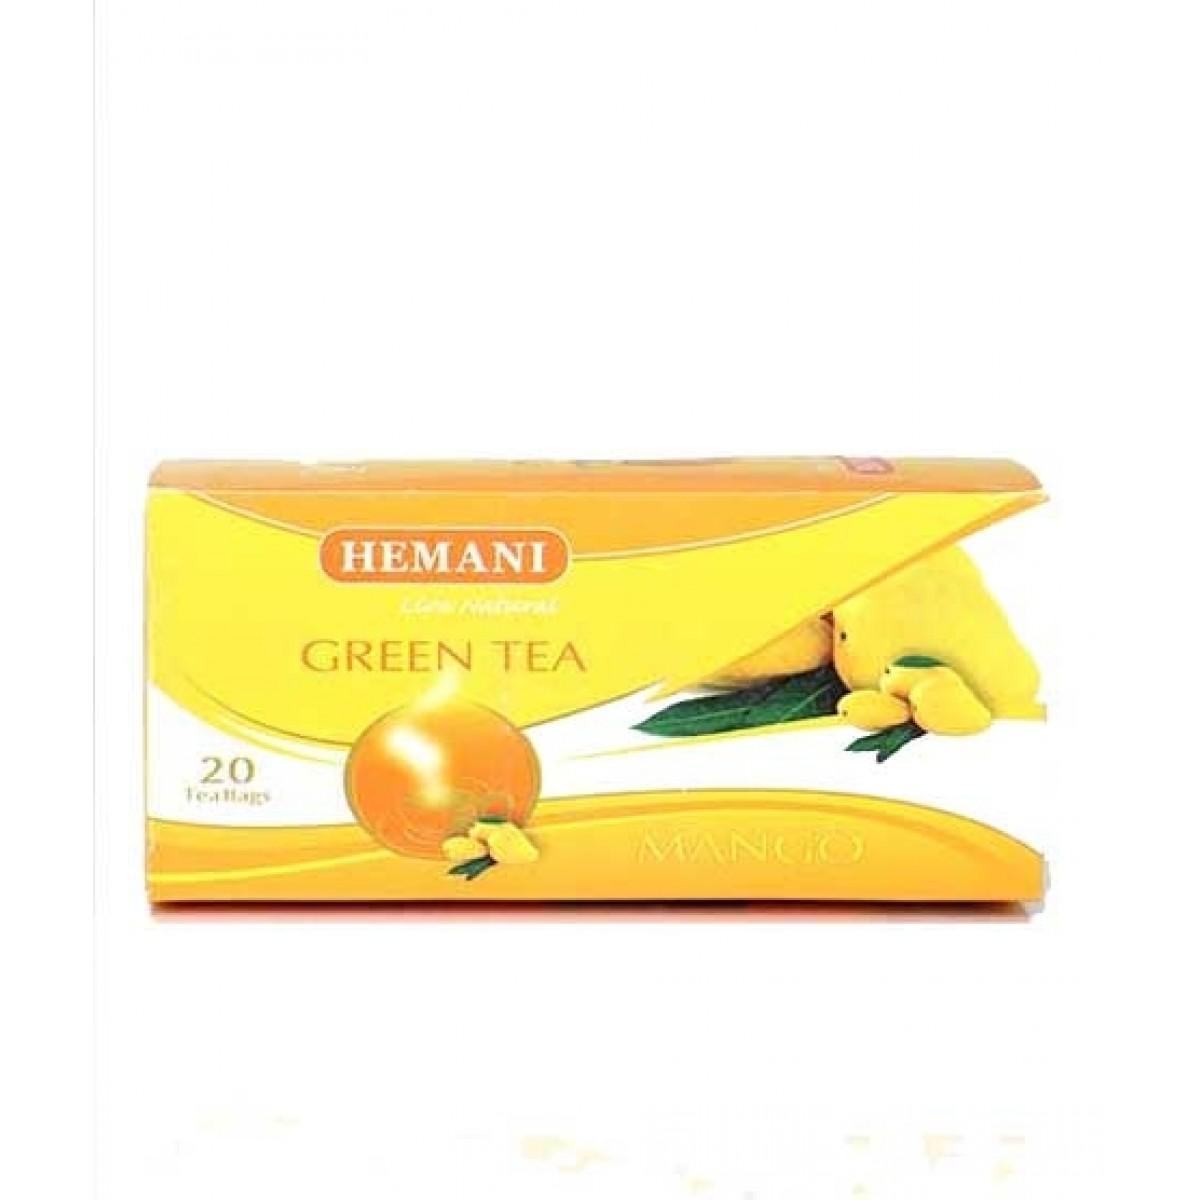 Hemani Mango Green Tea 20 Tea Bags